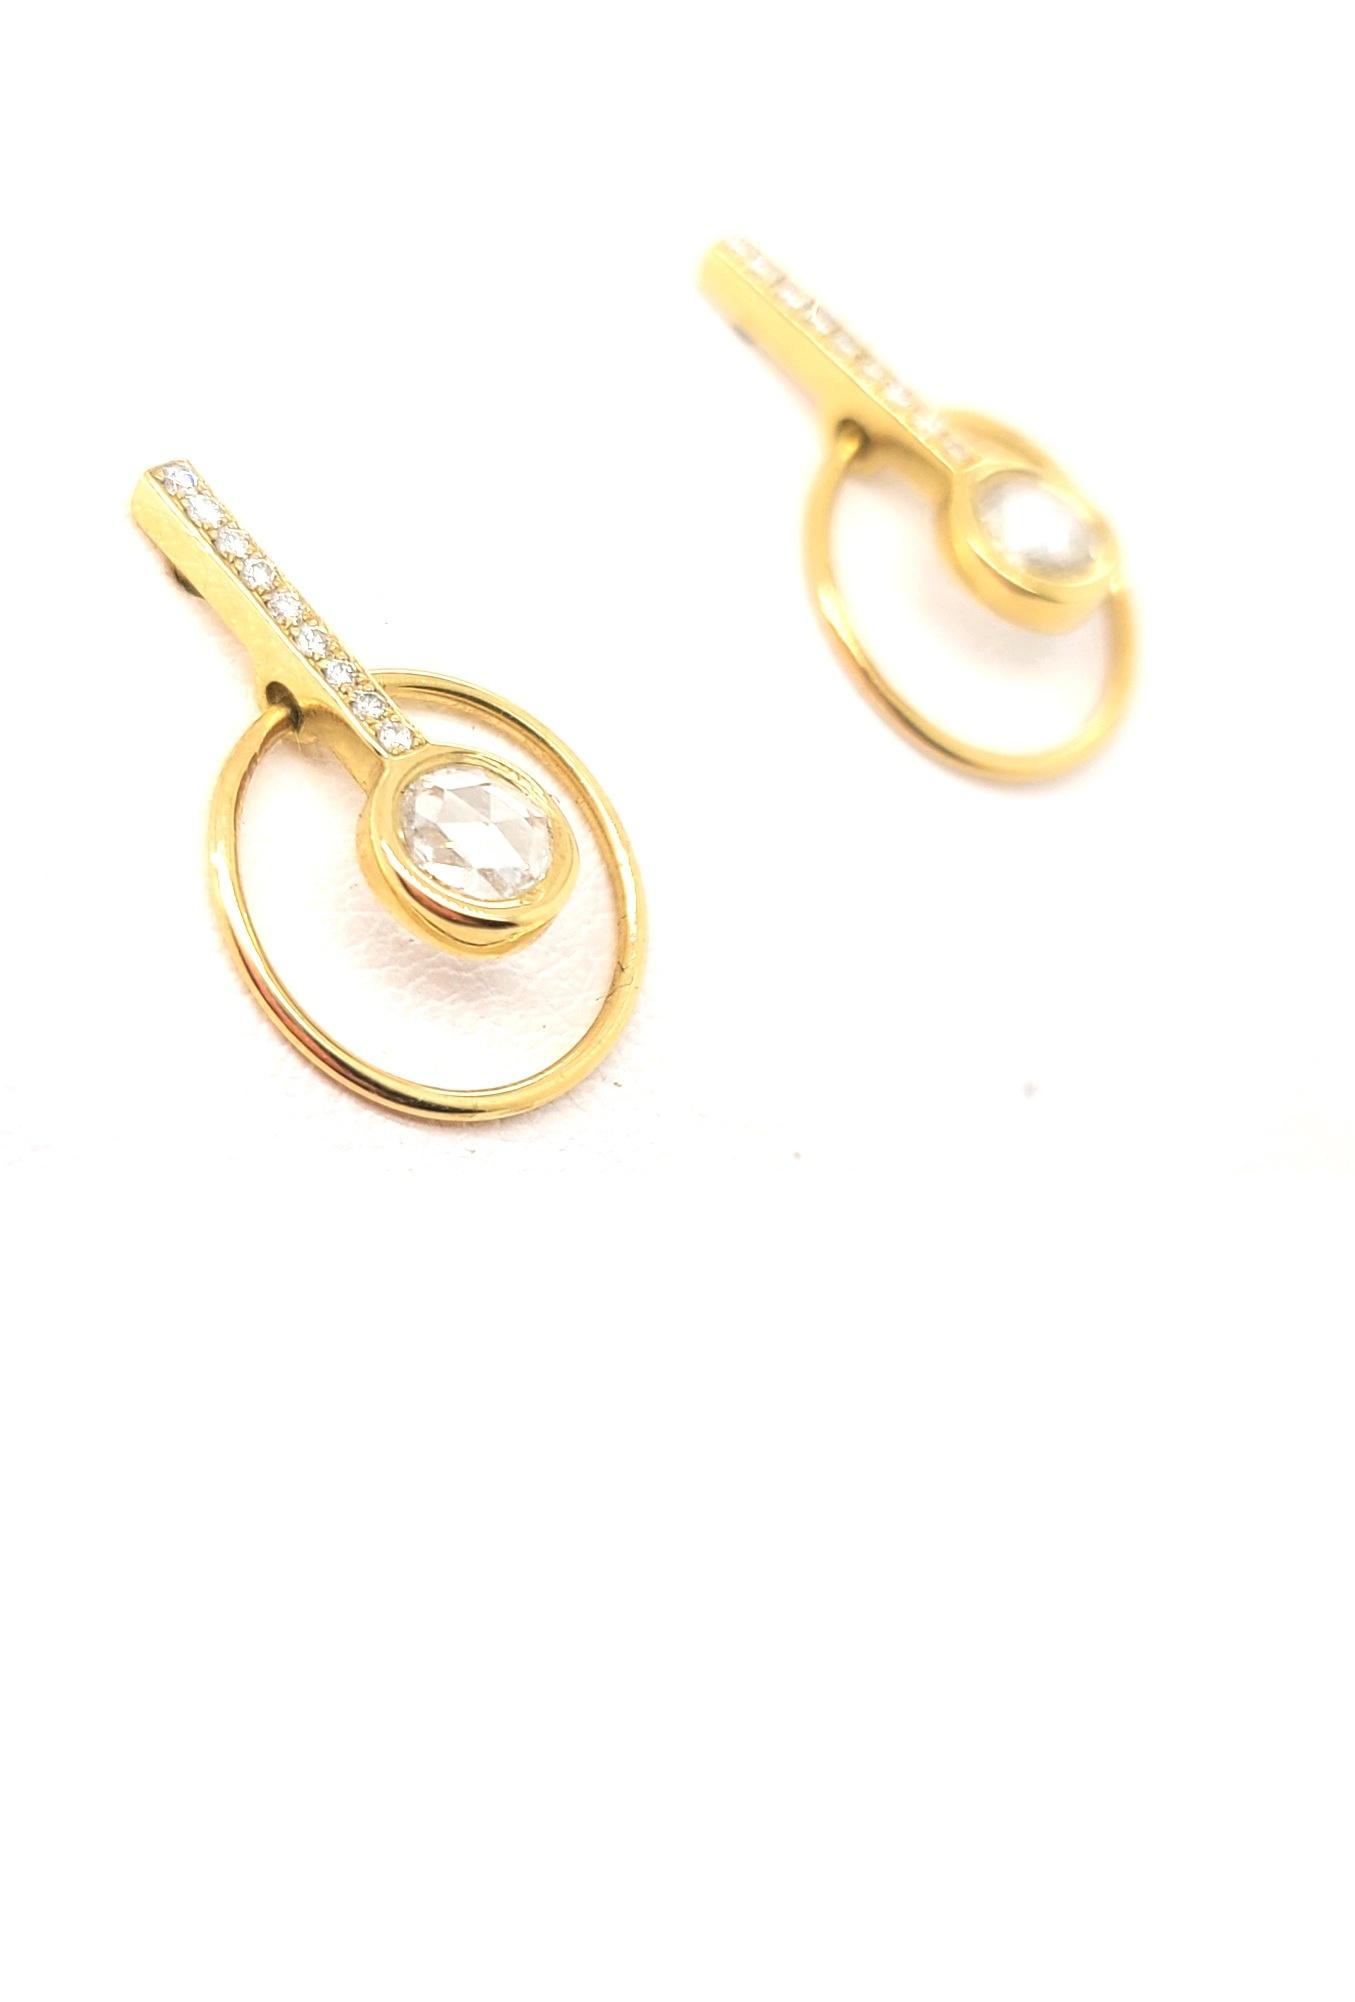 14kt Yellow Gold Circle & Bar Diamond Earrings